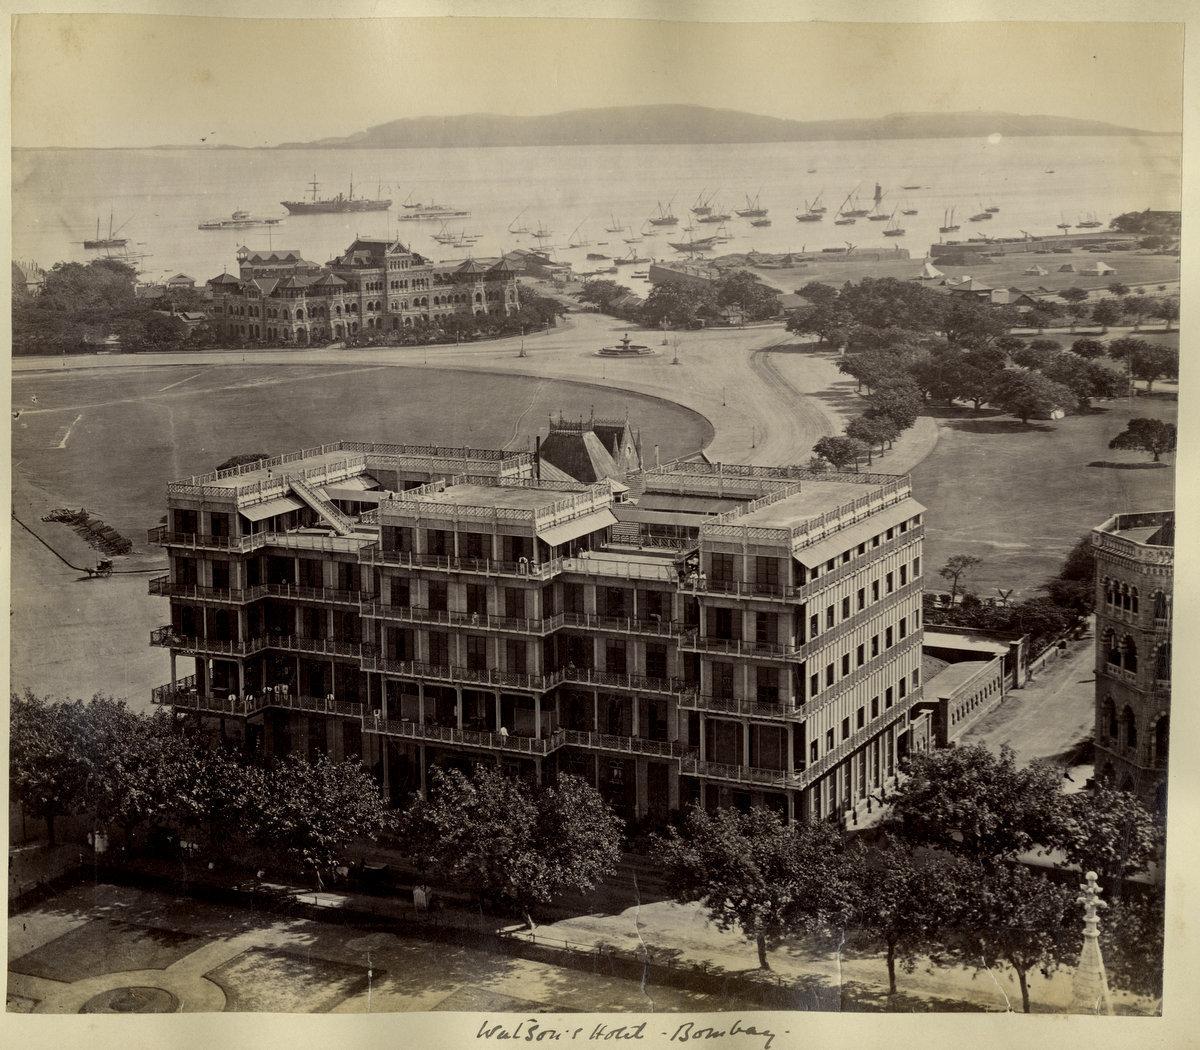 http://4.bp.blogspot.com/--ExkRfRY70M/UKKyTPsQxbI/AAAAAAAAUhc/-qYgREY1WMA/s1600/Watson%27s+Hotel,+Bombay+(Mumbai)+-+c1880%27s.JPG